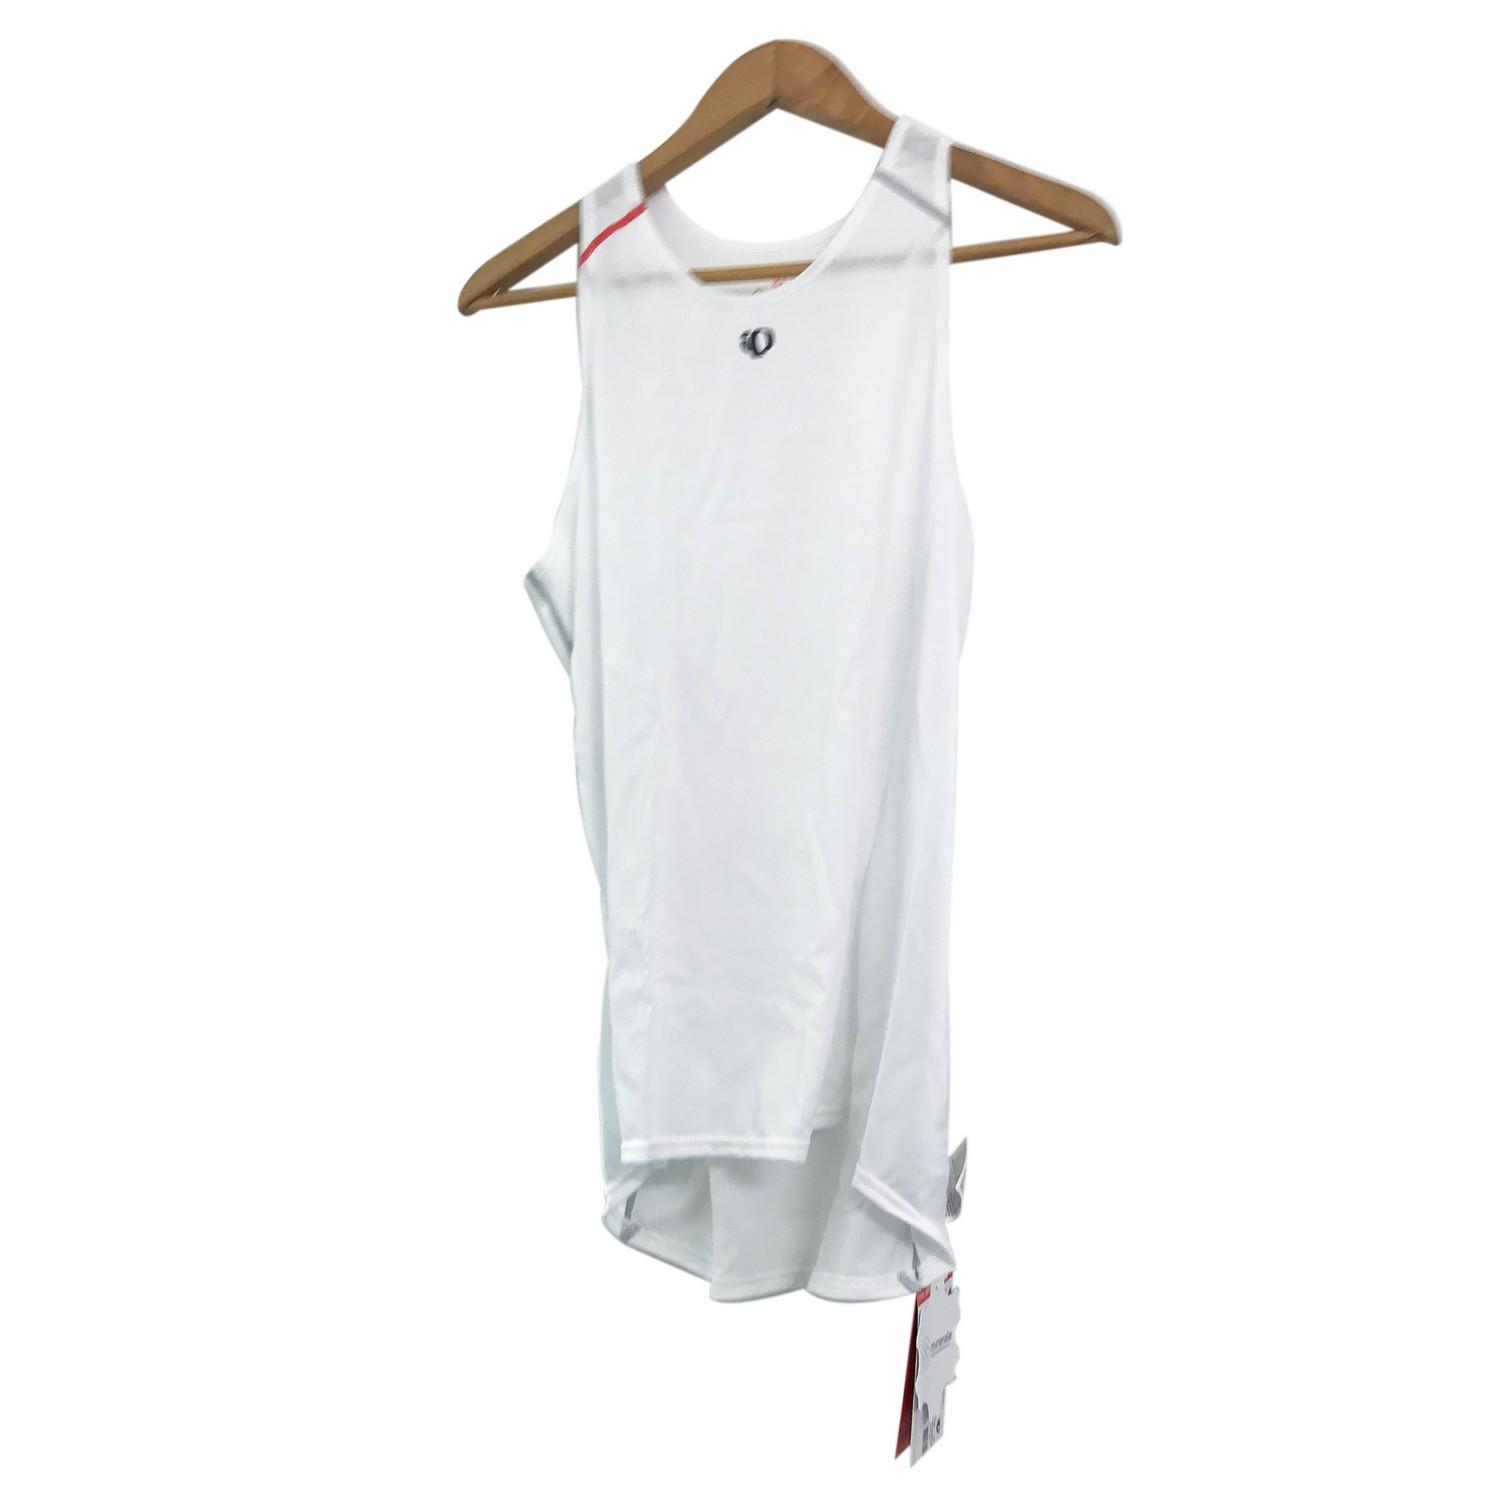 Pearl Izumi Cycling Bike Women Base Layer Sports Shirt Top TRANSFER White M NWT